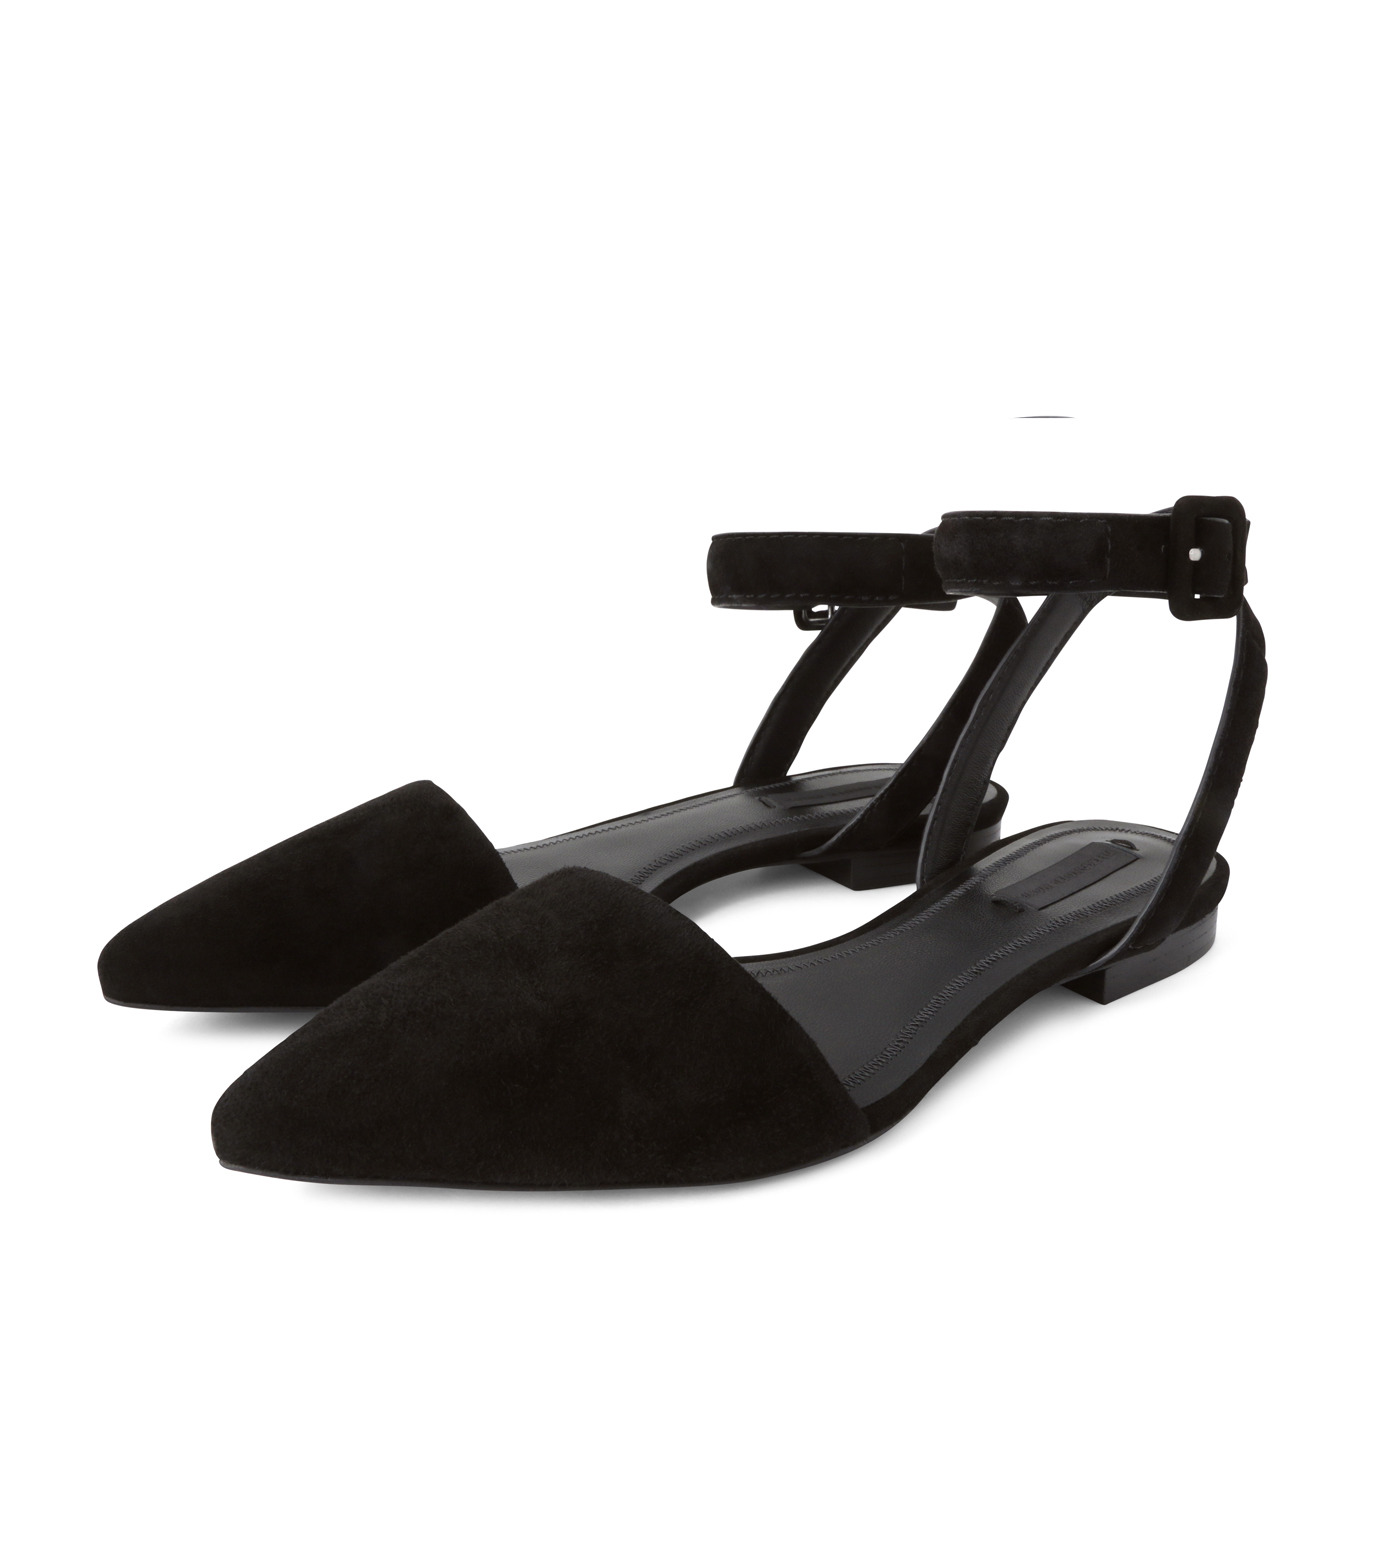 Alexander Wang(アレキサンダーワン)のLauren Flat-BLACK(シューズ/shoes)-301129P16-13 拡大詳細画像3